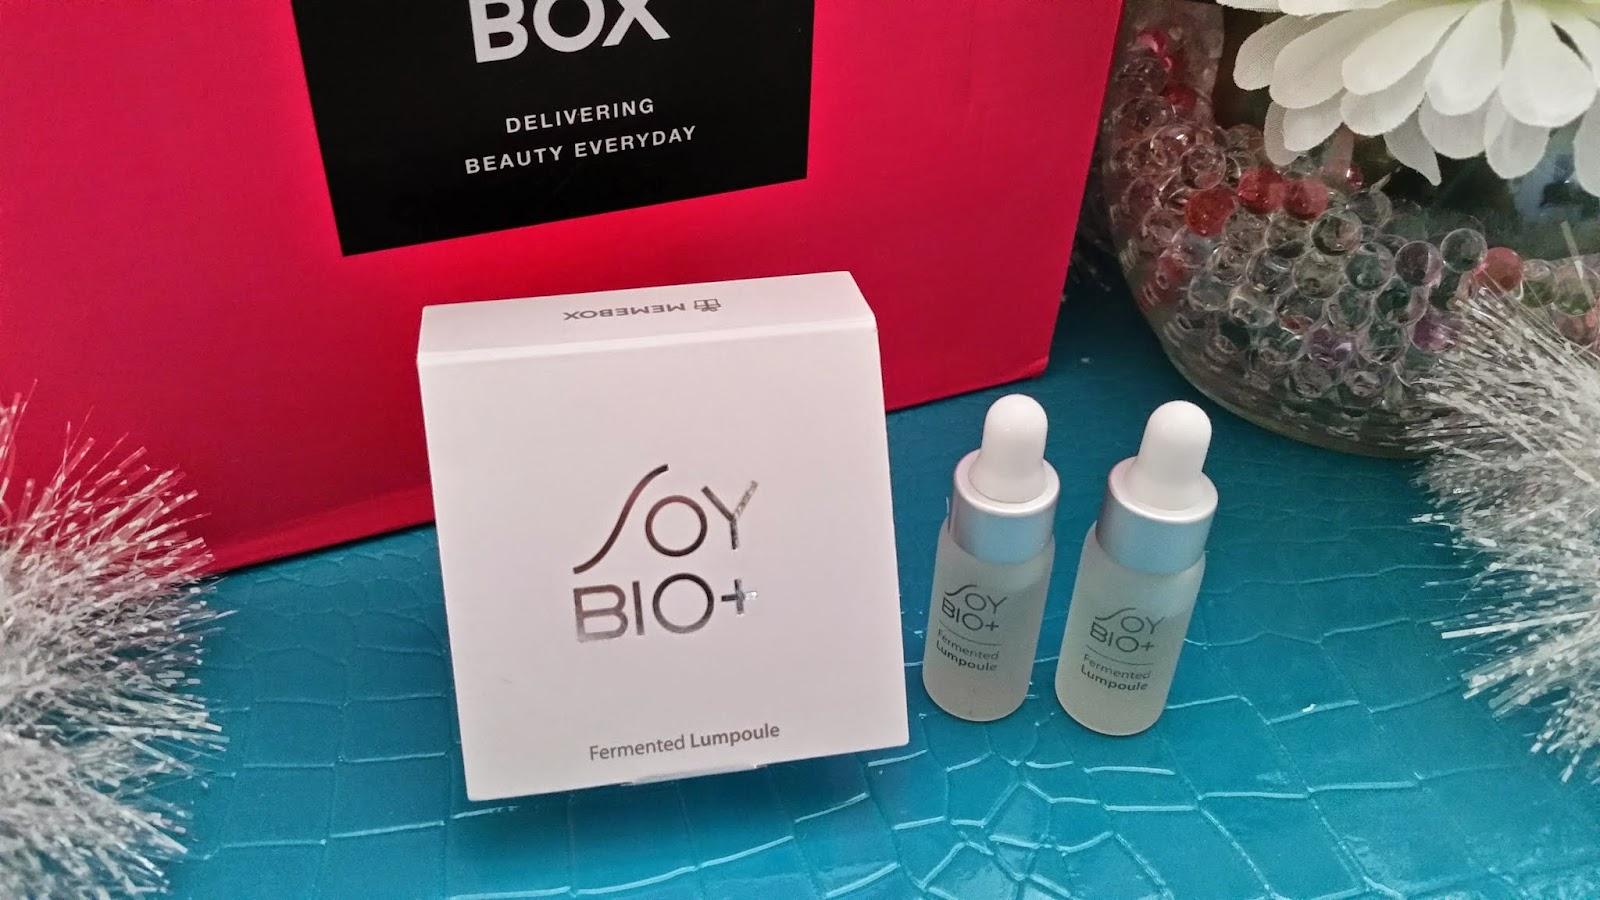 Soy Bio+ Fermented Lumpole